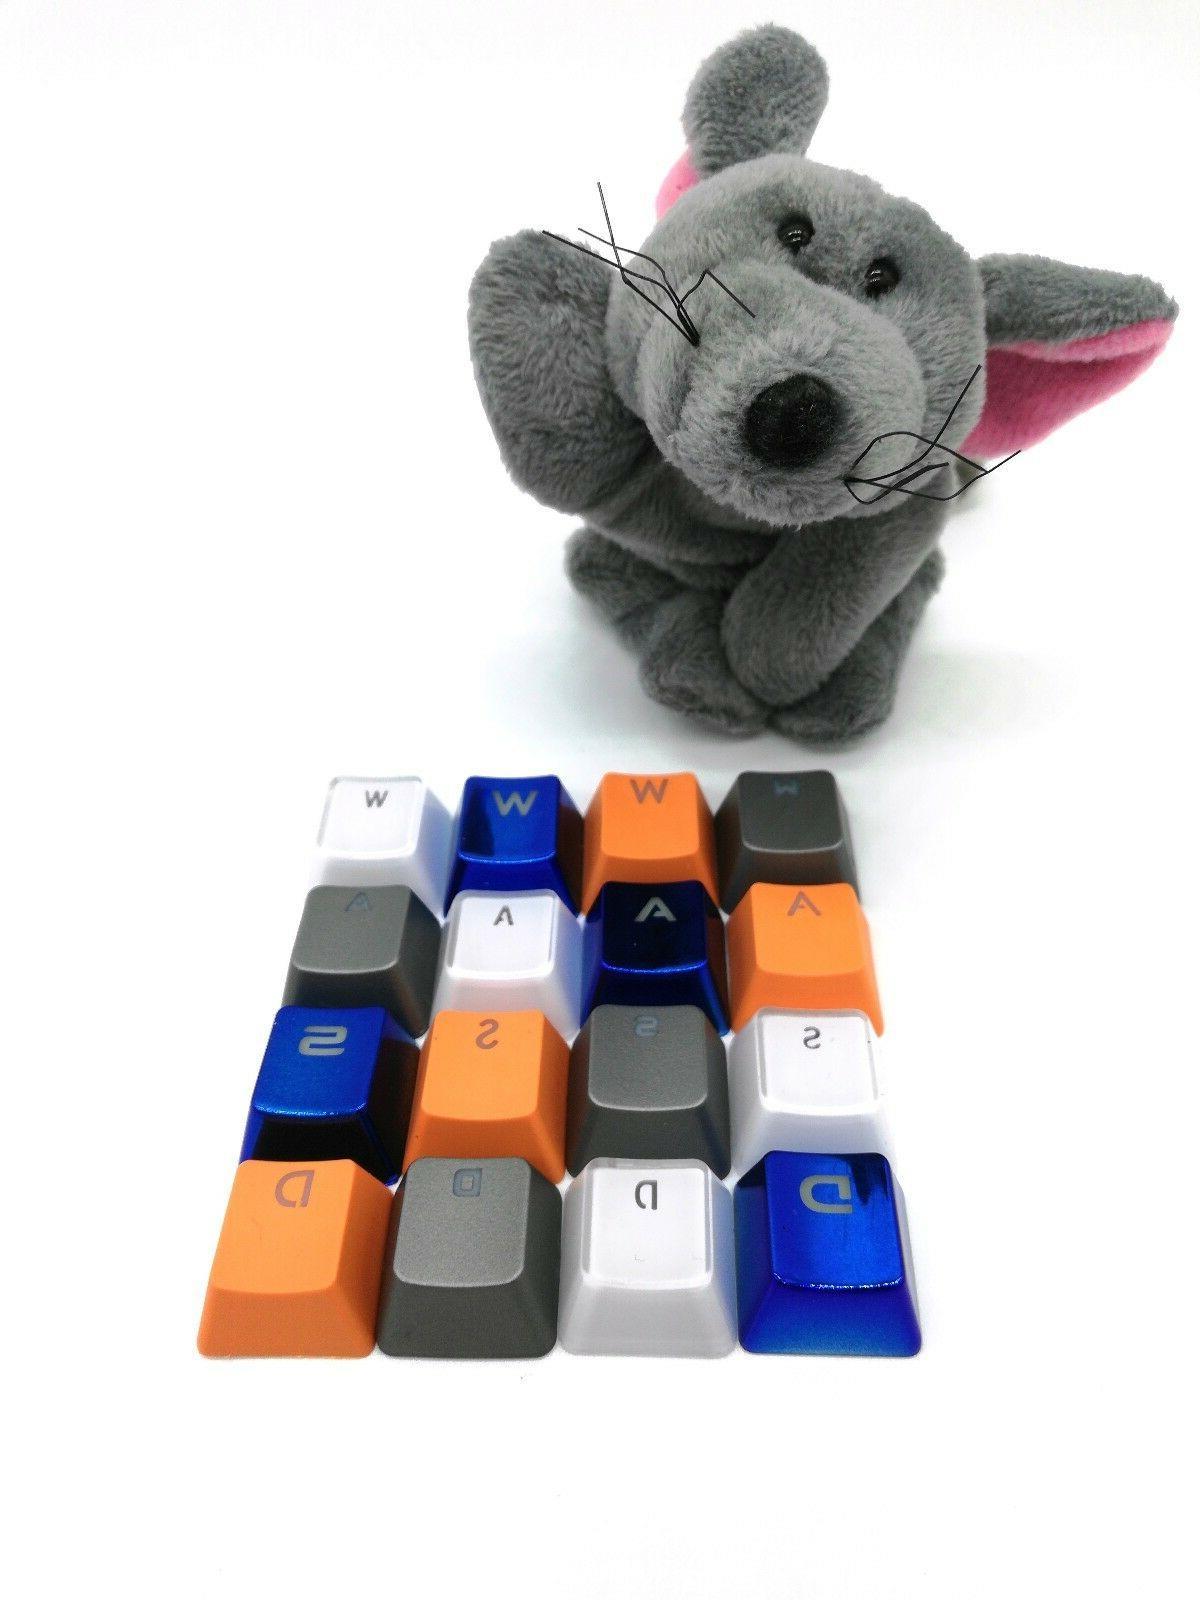 keycaps key sets for cherry mx mechanical